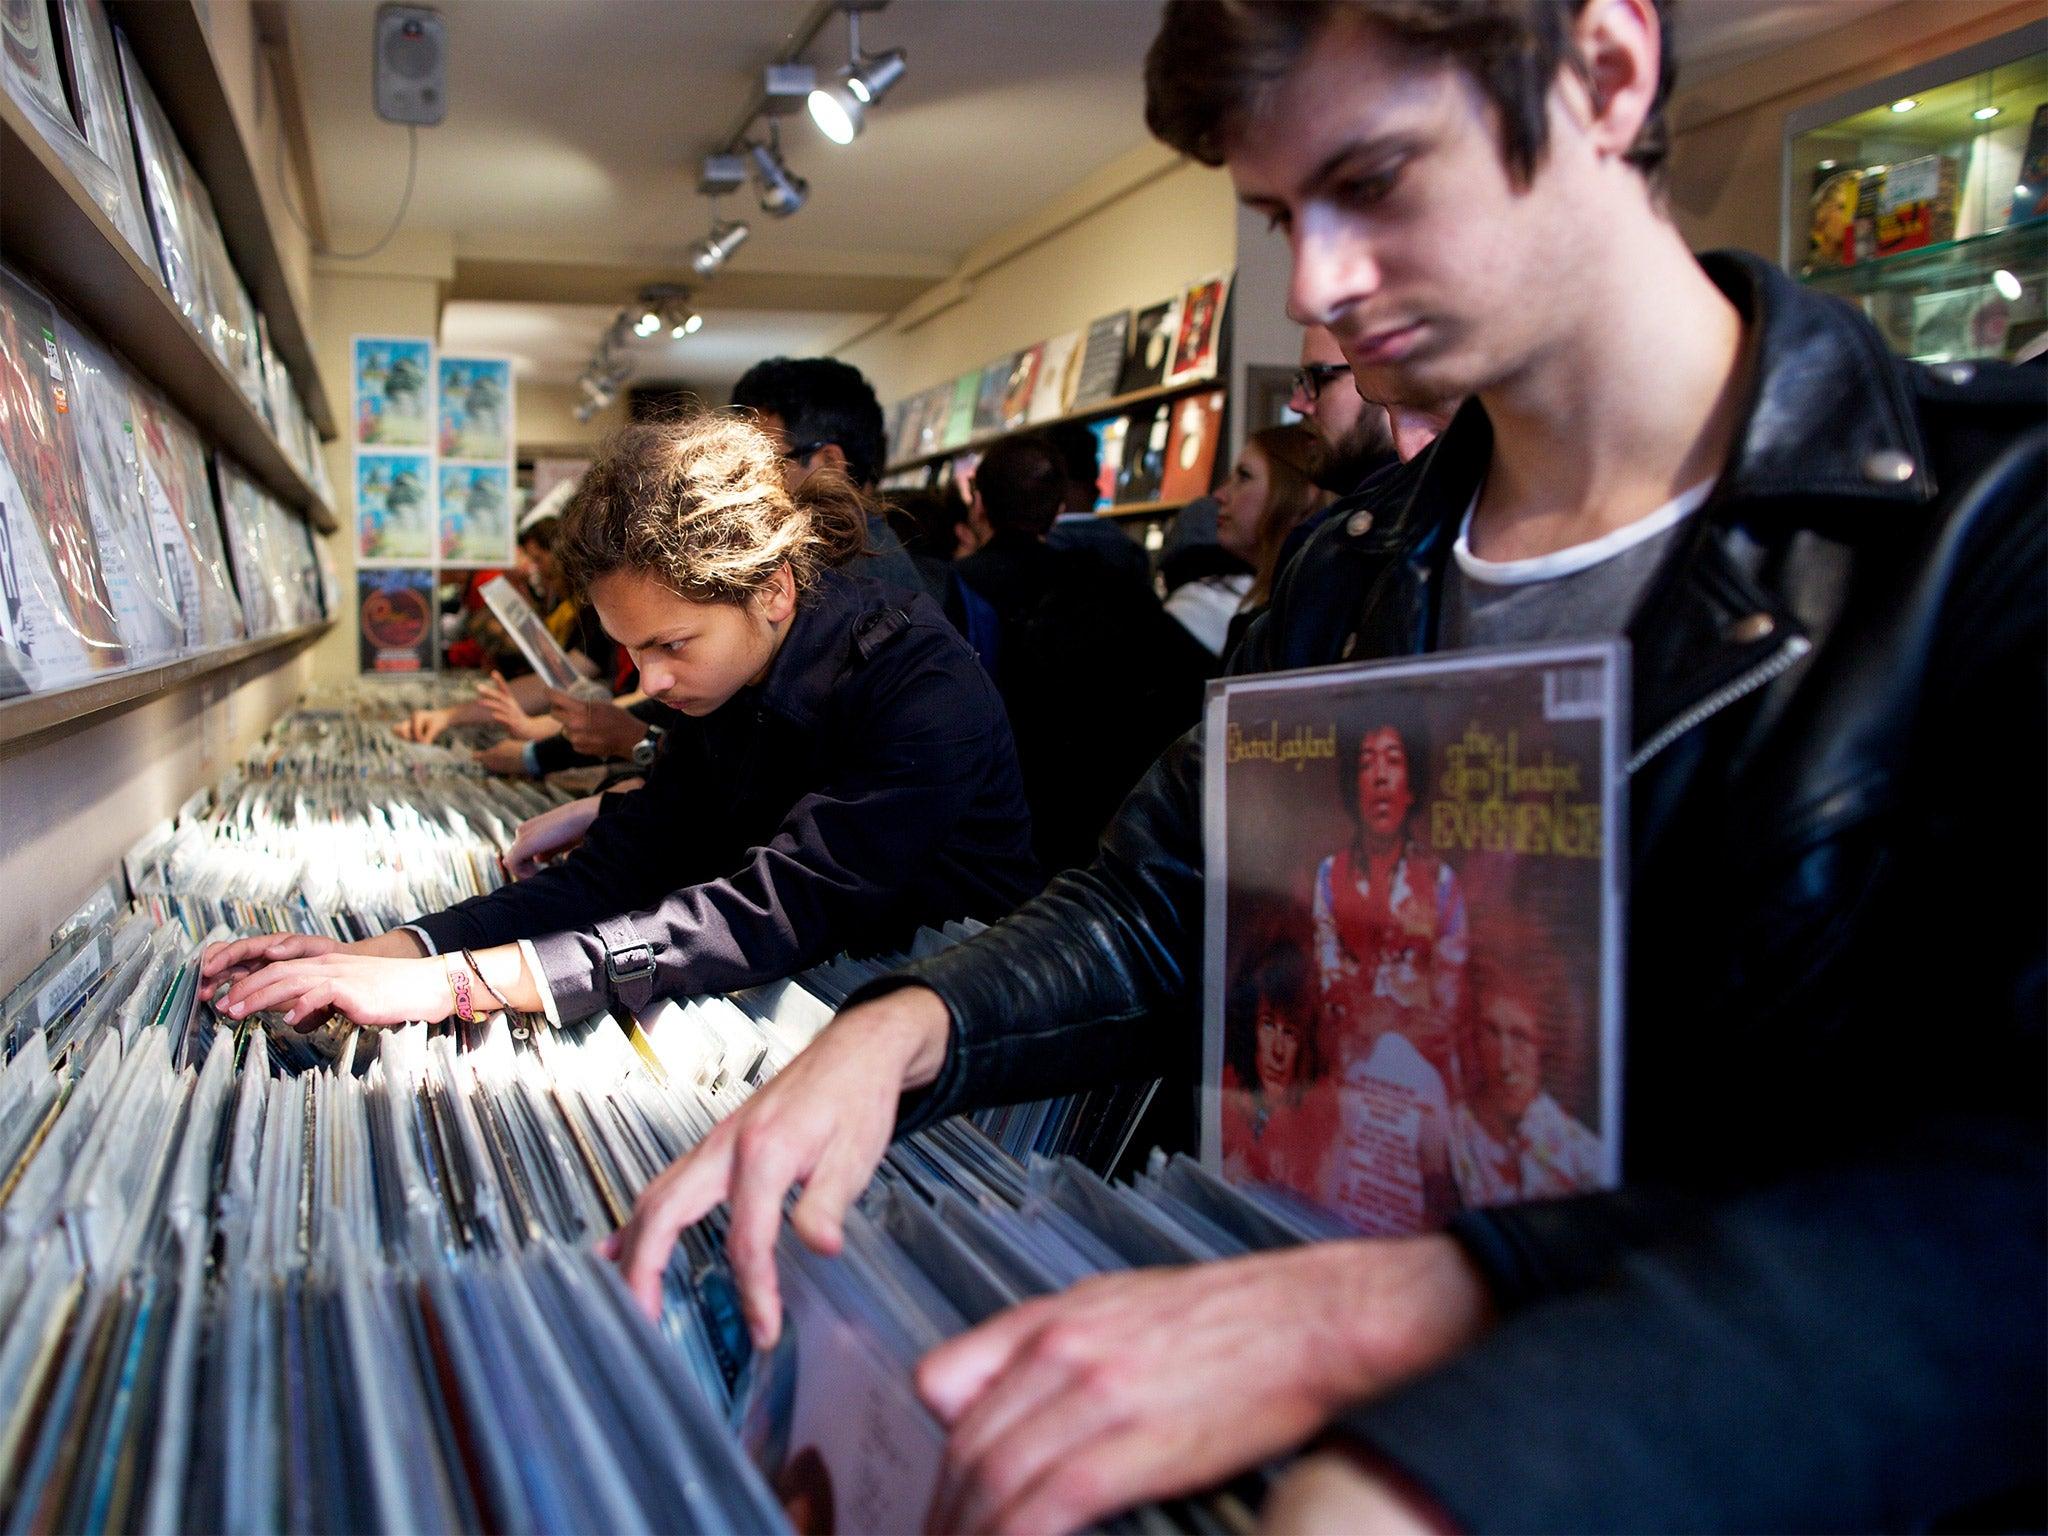 New vinyl singles chart sends pop back to 70s